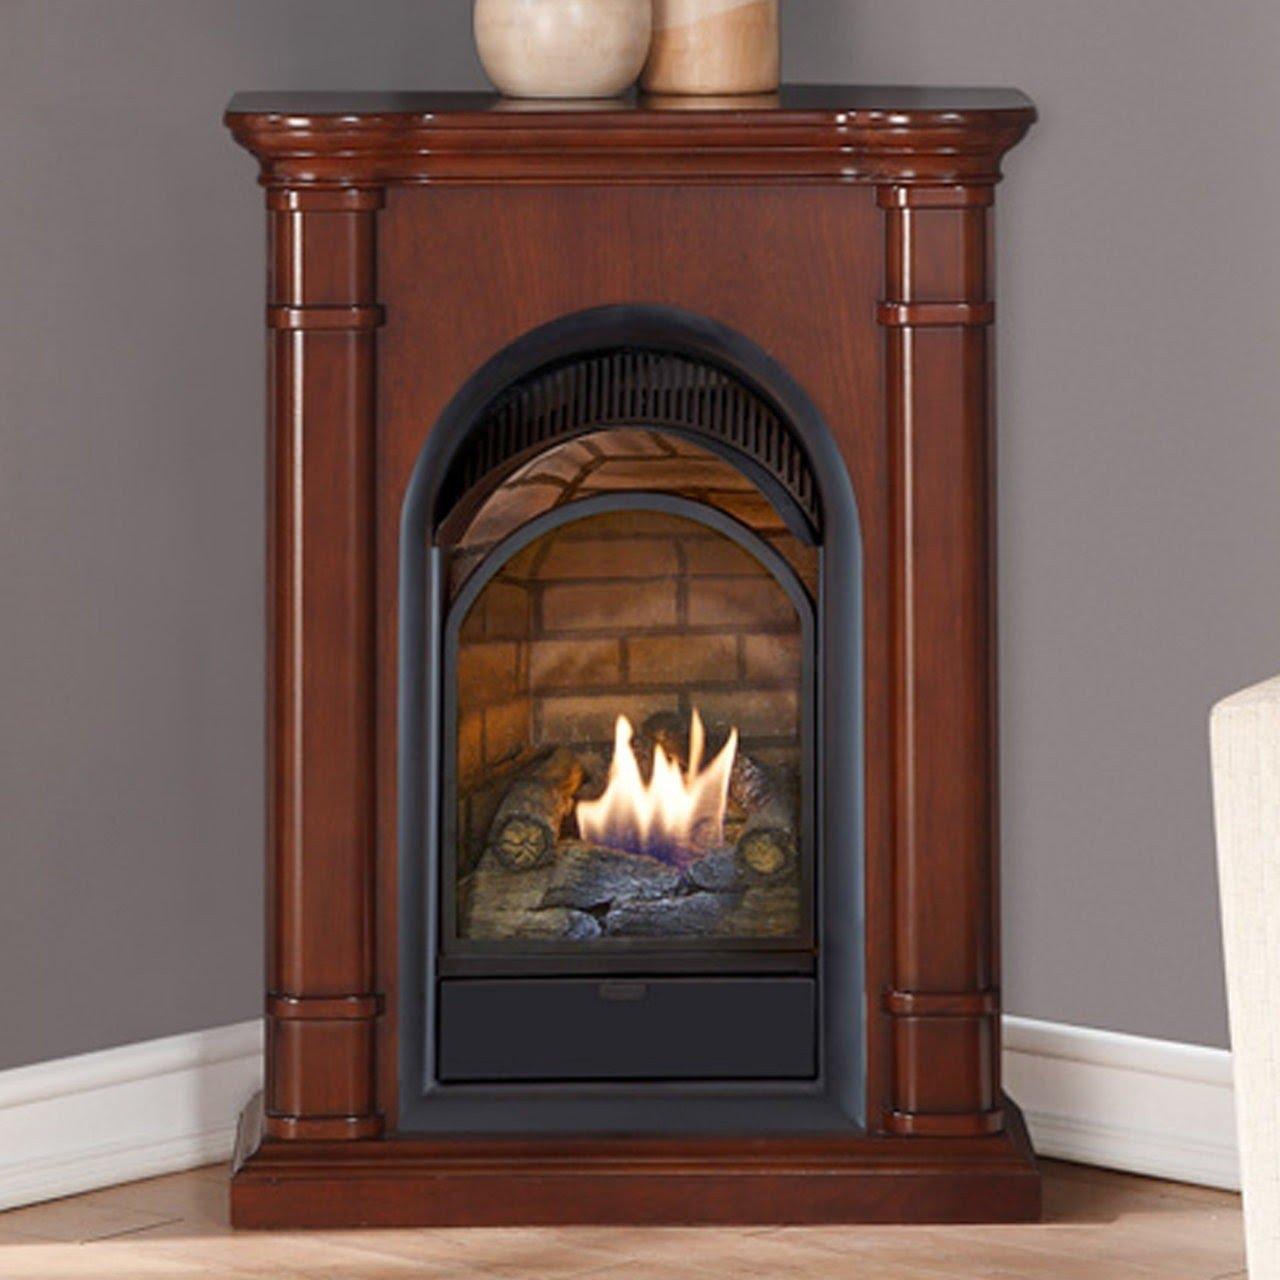 corner ventless gas fireplace visual hunt rh visualhunt com ventless propane fireplaces for sale propane ventless fireplace with mantel